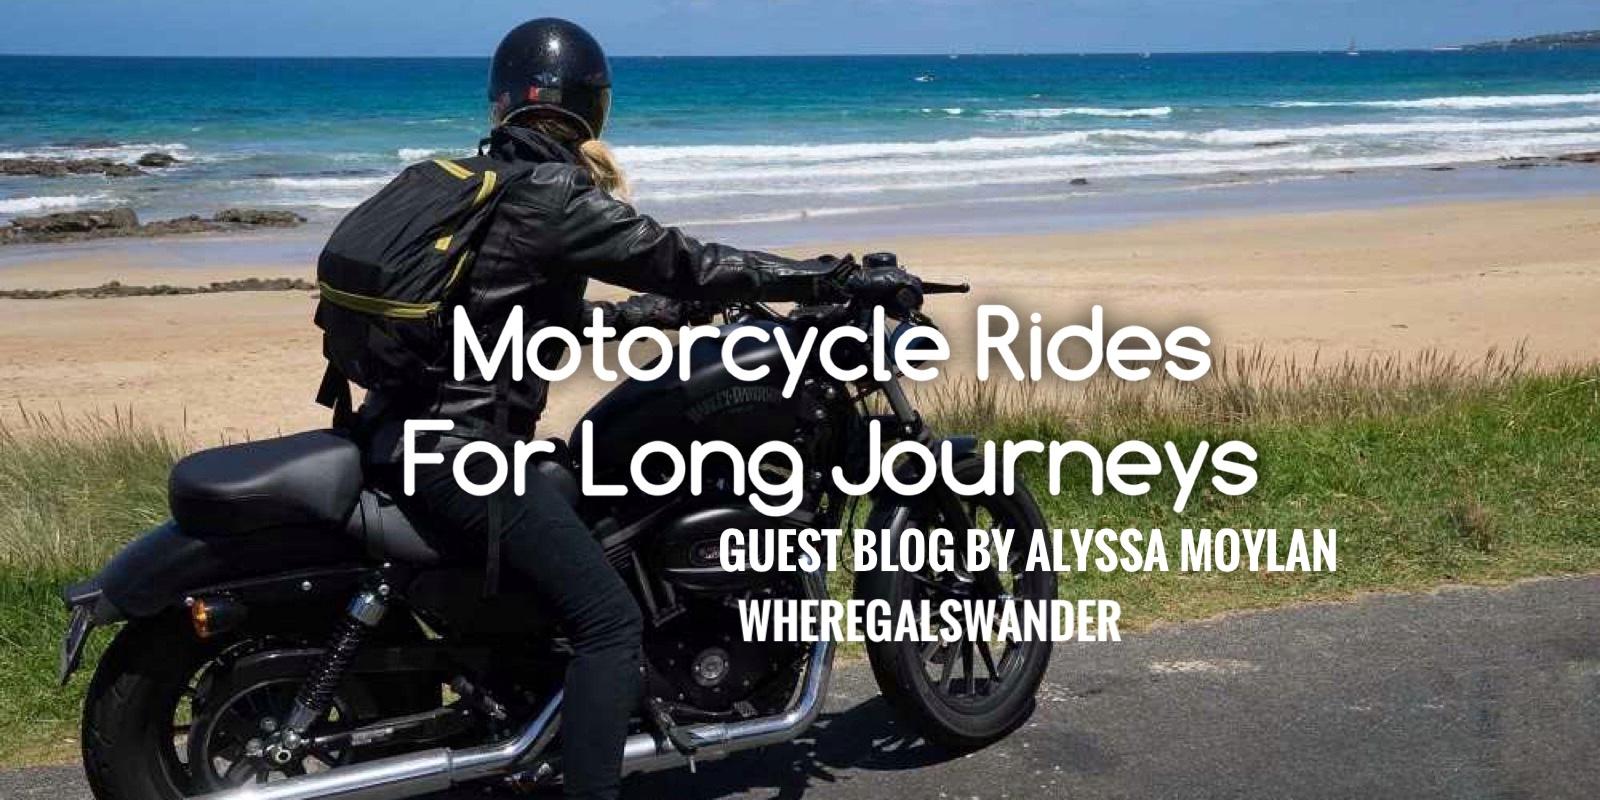 Moylan_WhereGalsWander_Guest_Blog_Travel_Motorcycle_Riding_Travel_Tips_2019